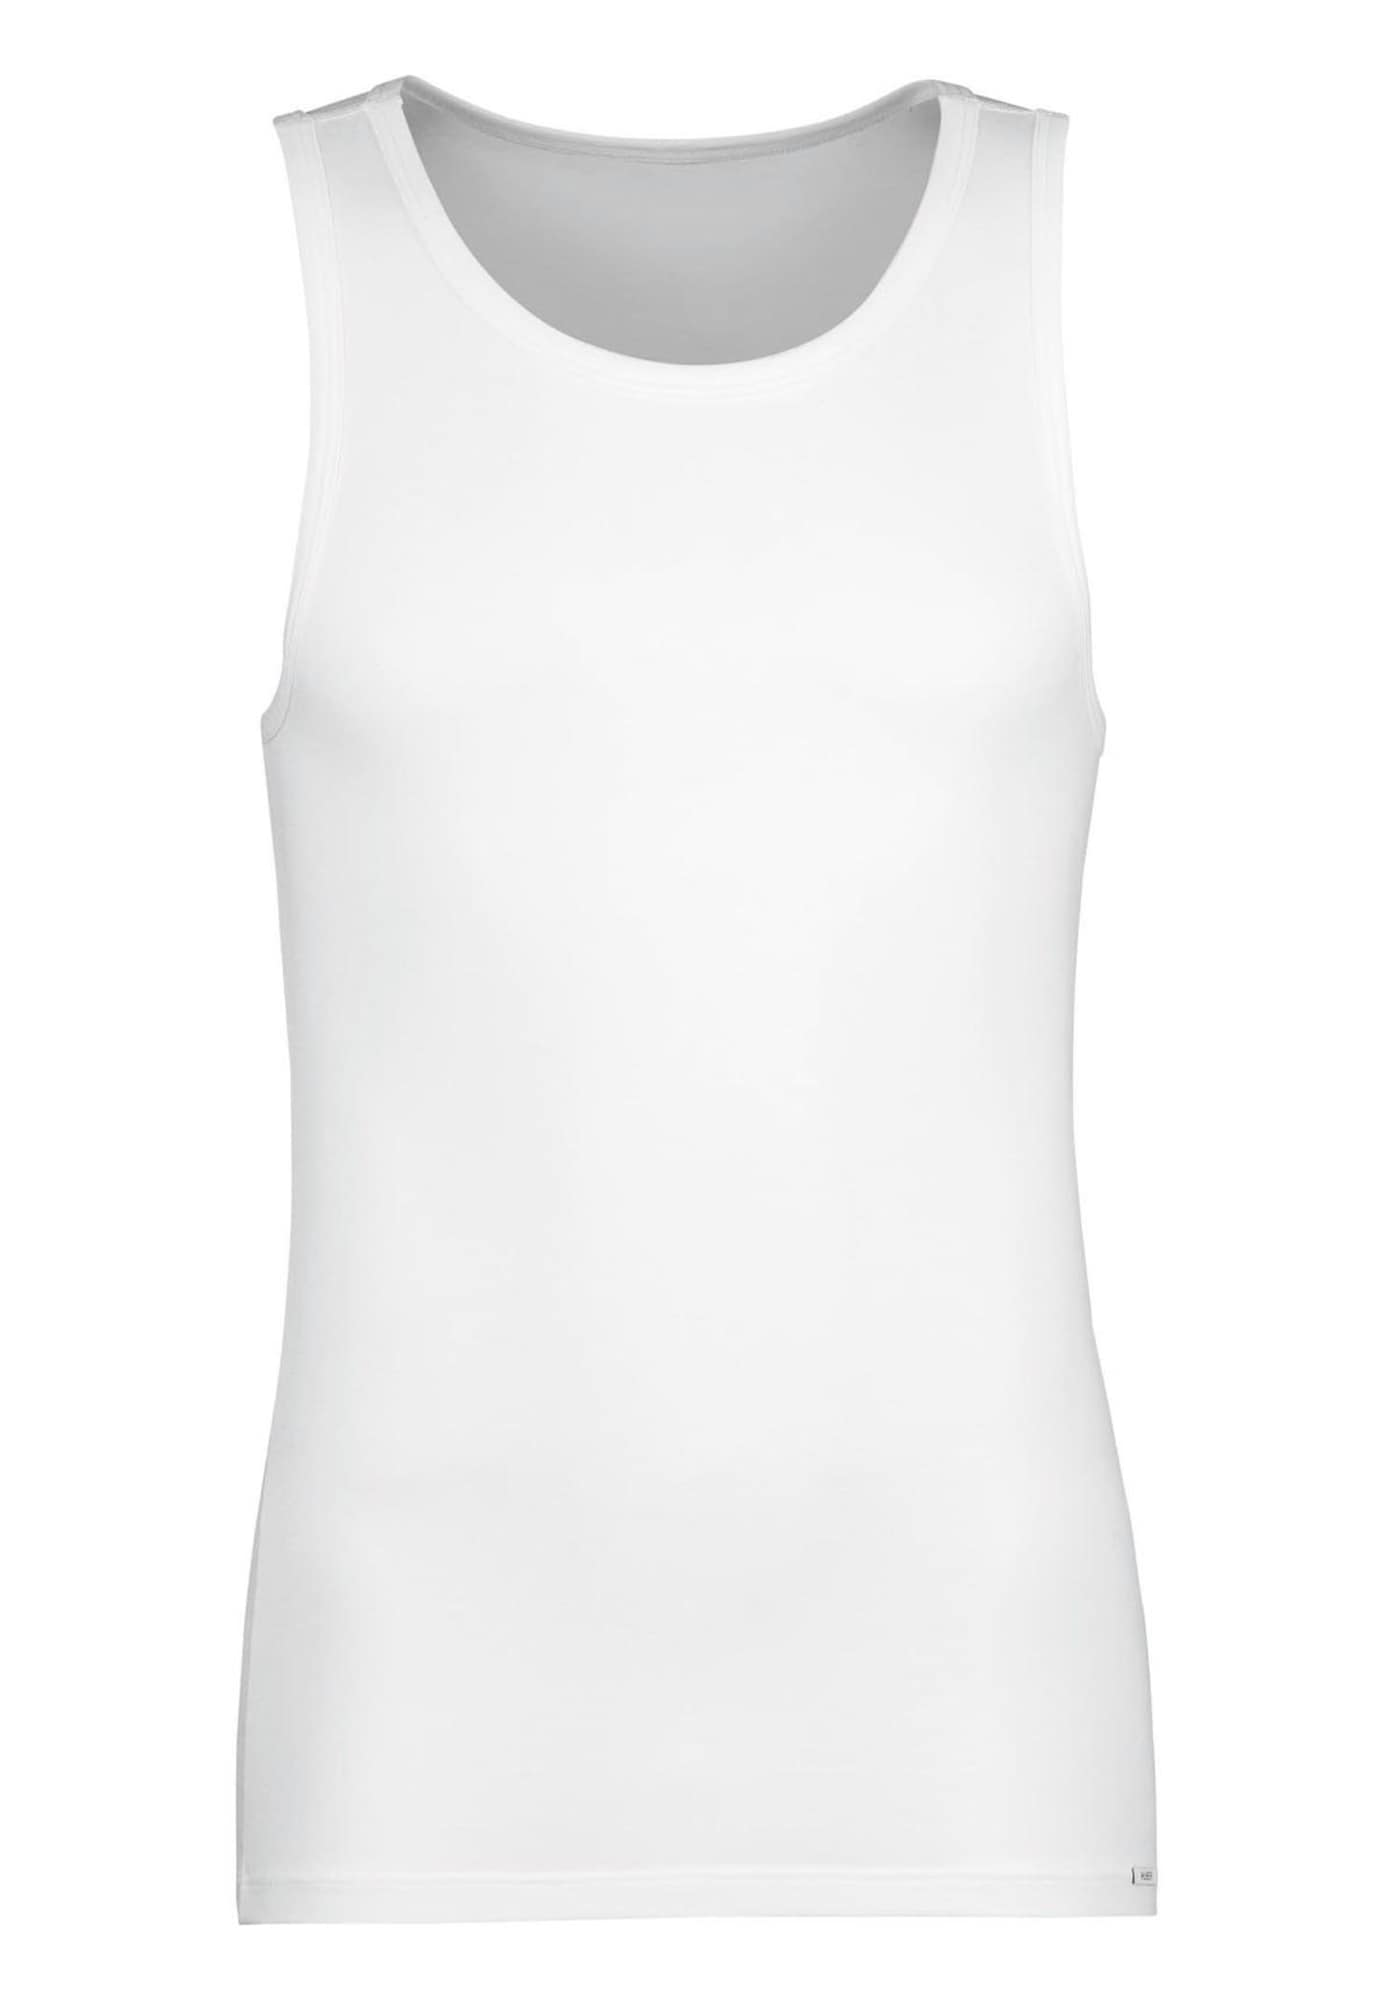 Unterhemd 'Selective Men' | Bekleidung > Wäsche > Unterhemden | HUBER